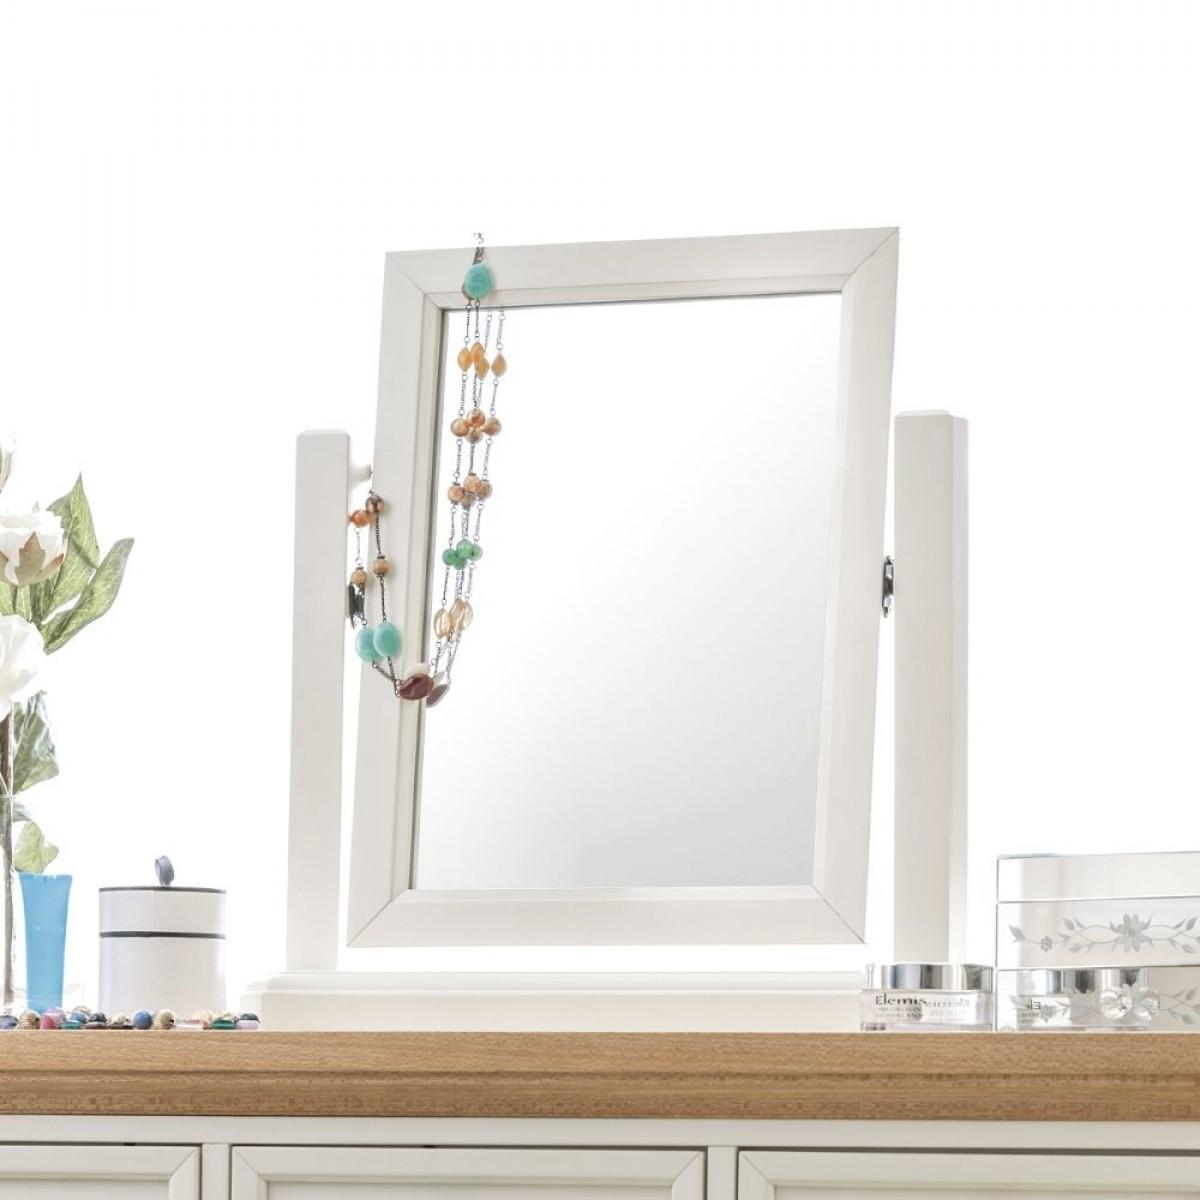 Portland Stone White and Oak Dressing Table Mirror - 53 x 54 cm